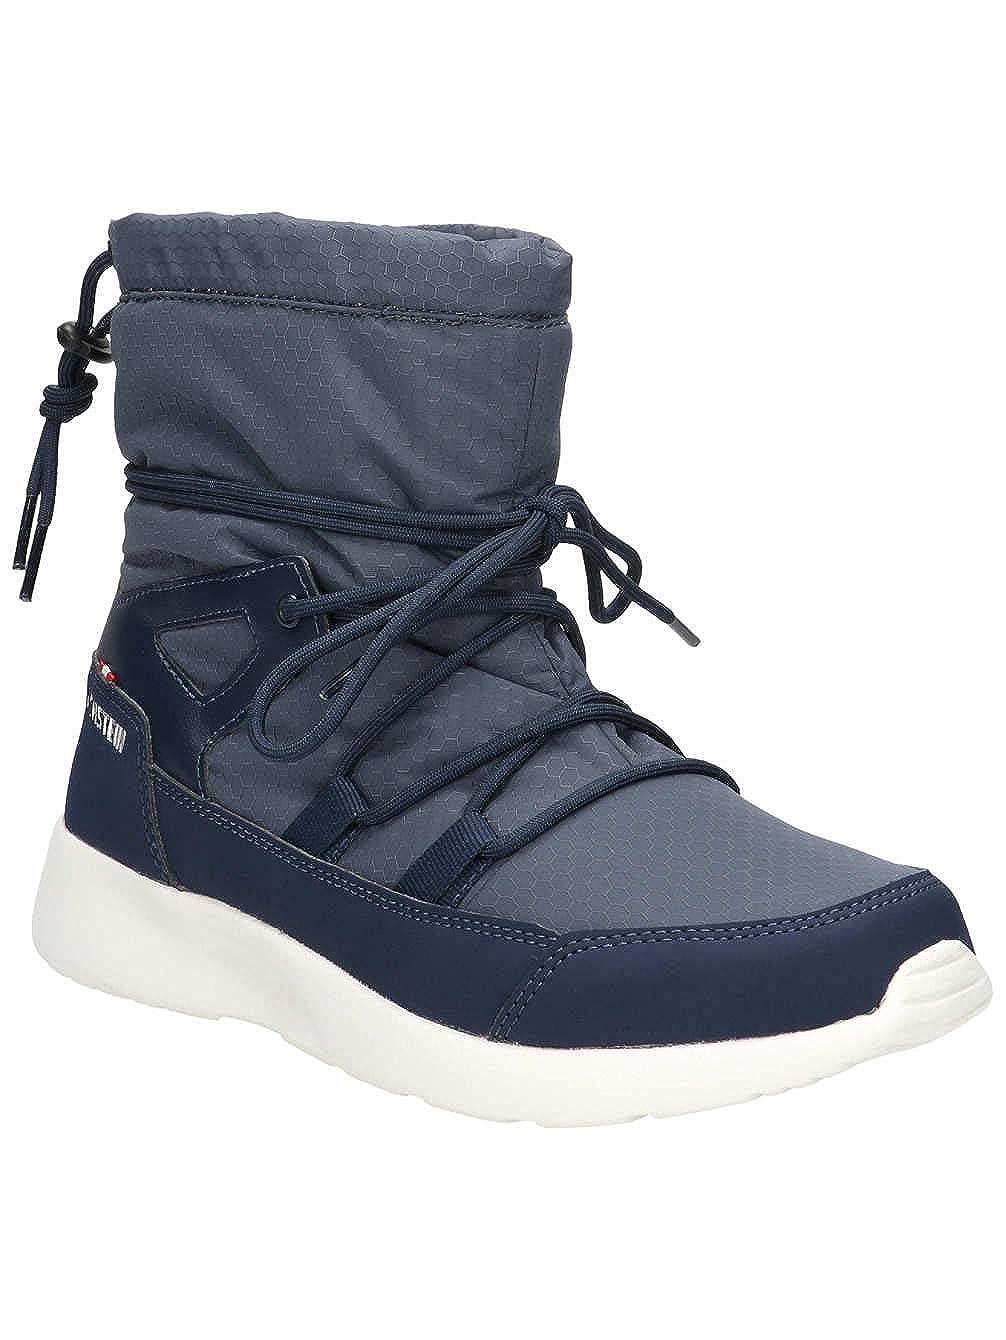 4661ac8129e3a8 Dachstein Damen Stiefel Stiefel Stiefel Ocean Low Stiefel damen 8cb231